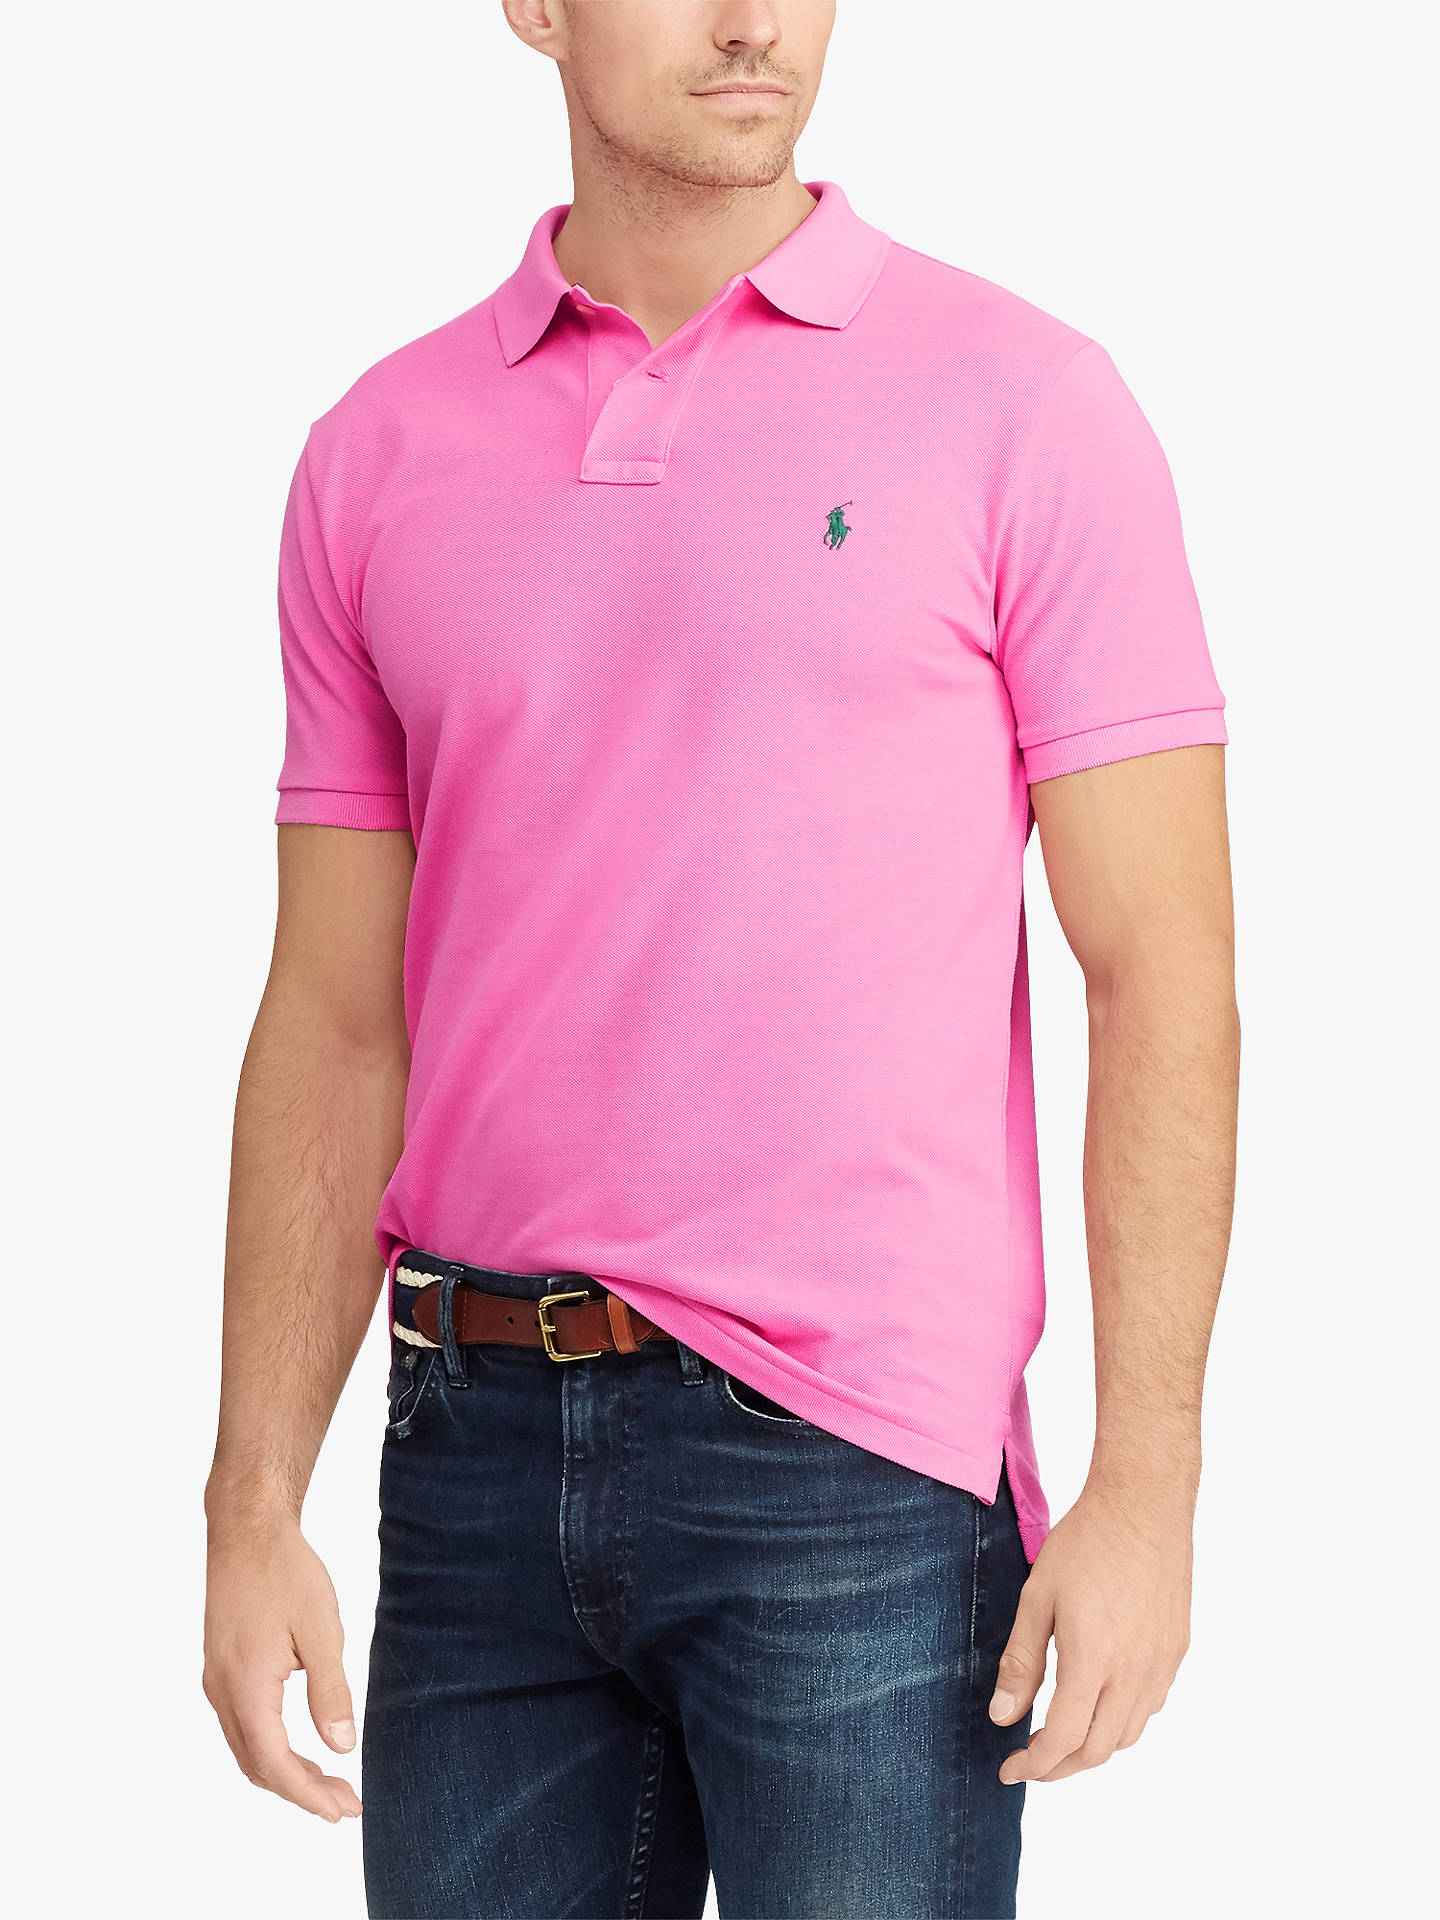 67c75a40 Buy Polo Ralph Lauren Polo Shirt, Maui Pink, S Online at johnlewis.com